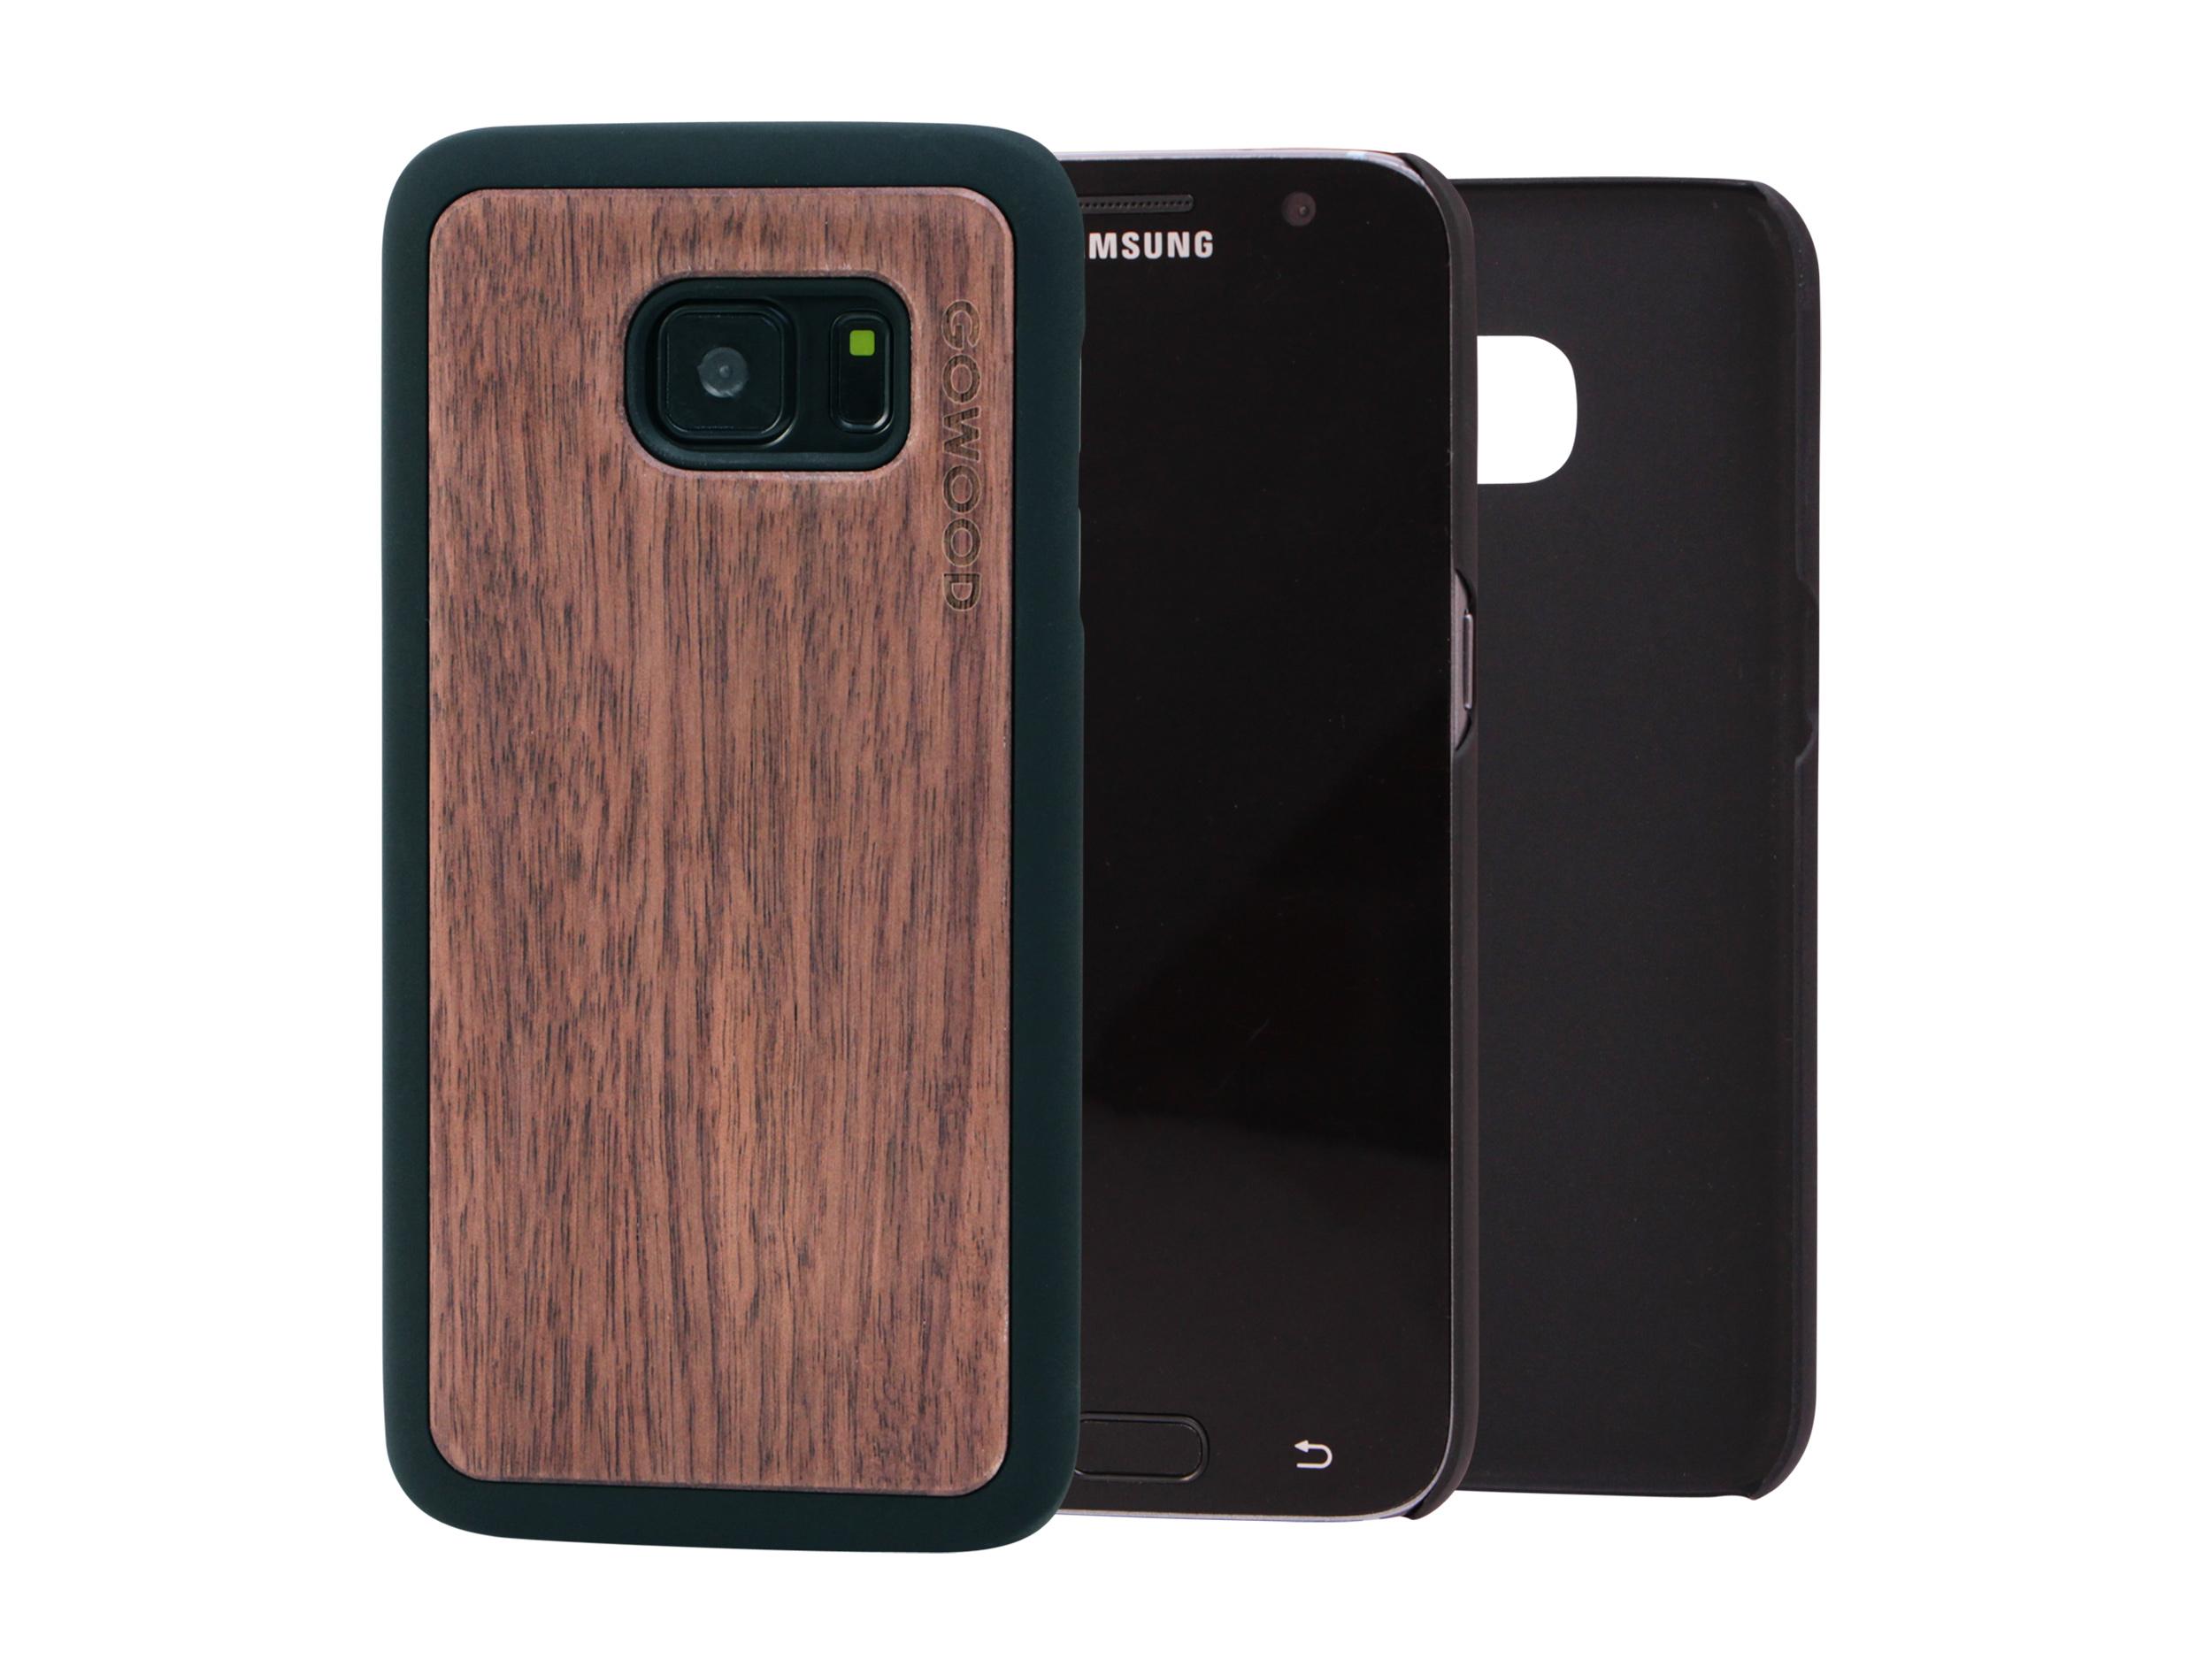 Samsung Galaxy S7 hoesje walnoot main